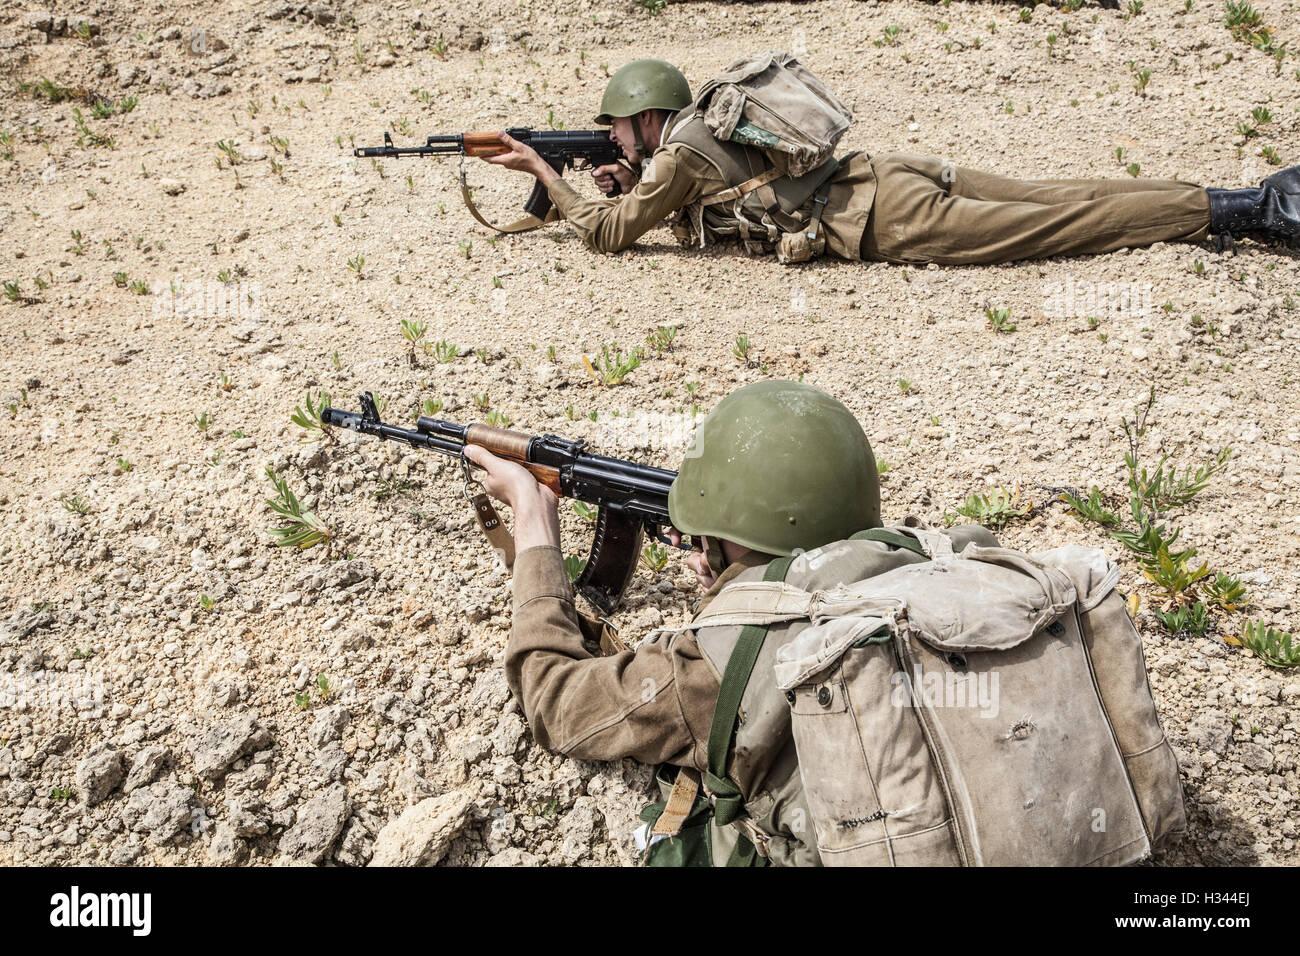 Soviet Afghanistan war - Page 6 Soviet-spetsnaz-in-afghanistan-H344EJ